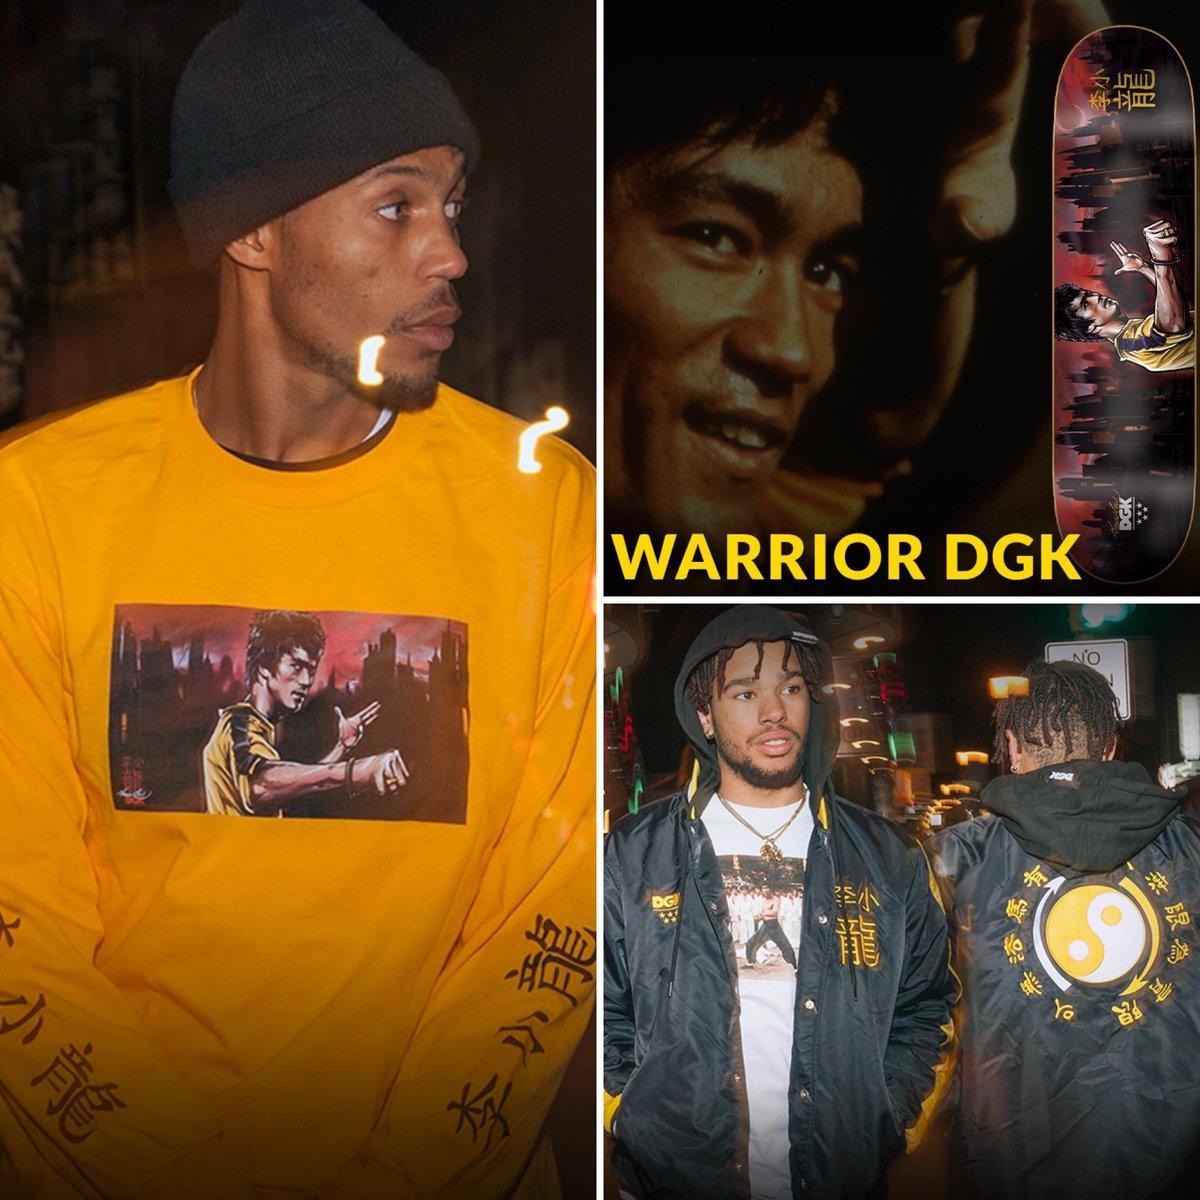 🐉⚡️Bruce Lee x DGK 🐉⚡️Flash Sale BL Store 🔗👉🏽 bit.ly/39UwJiK